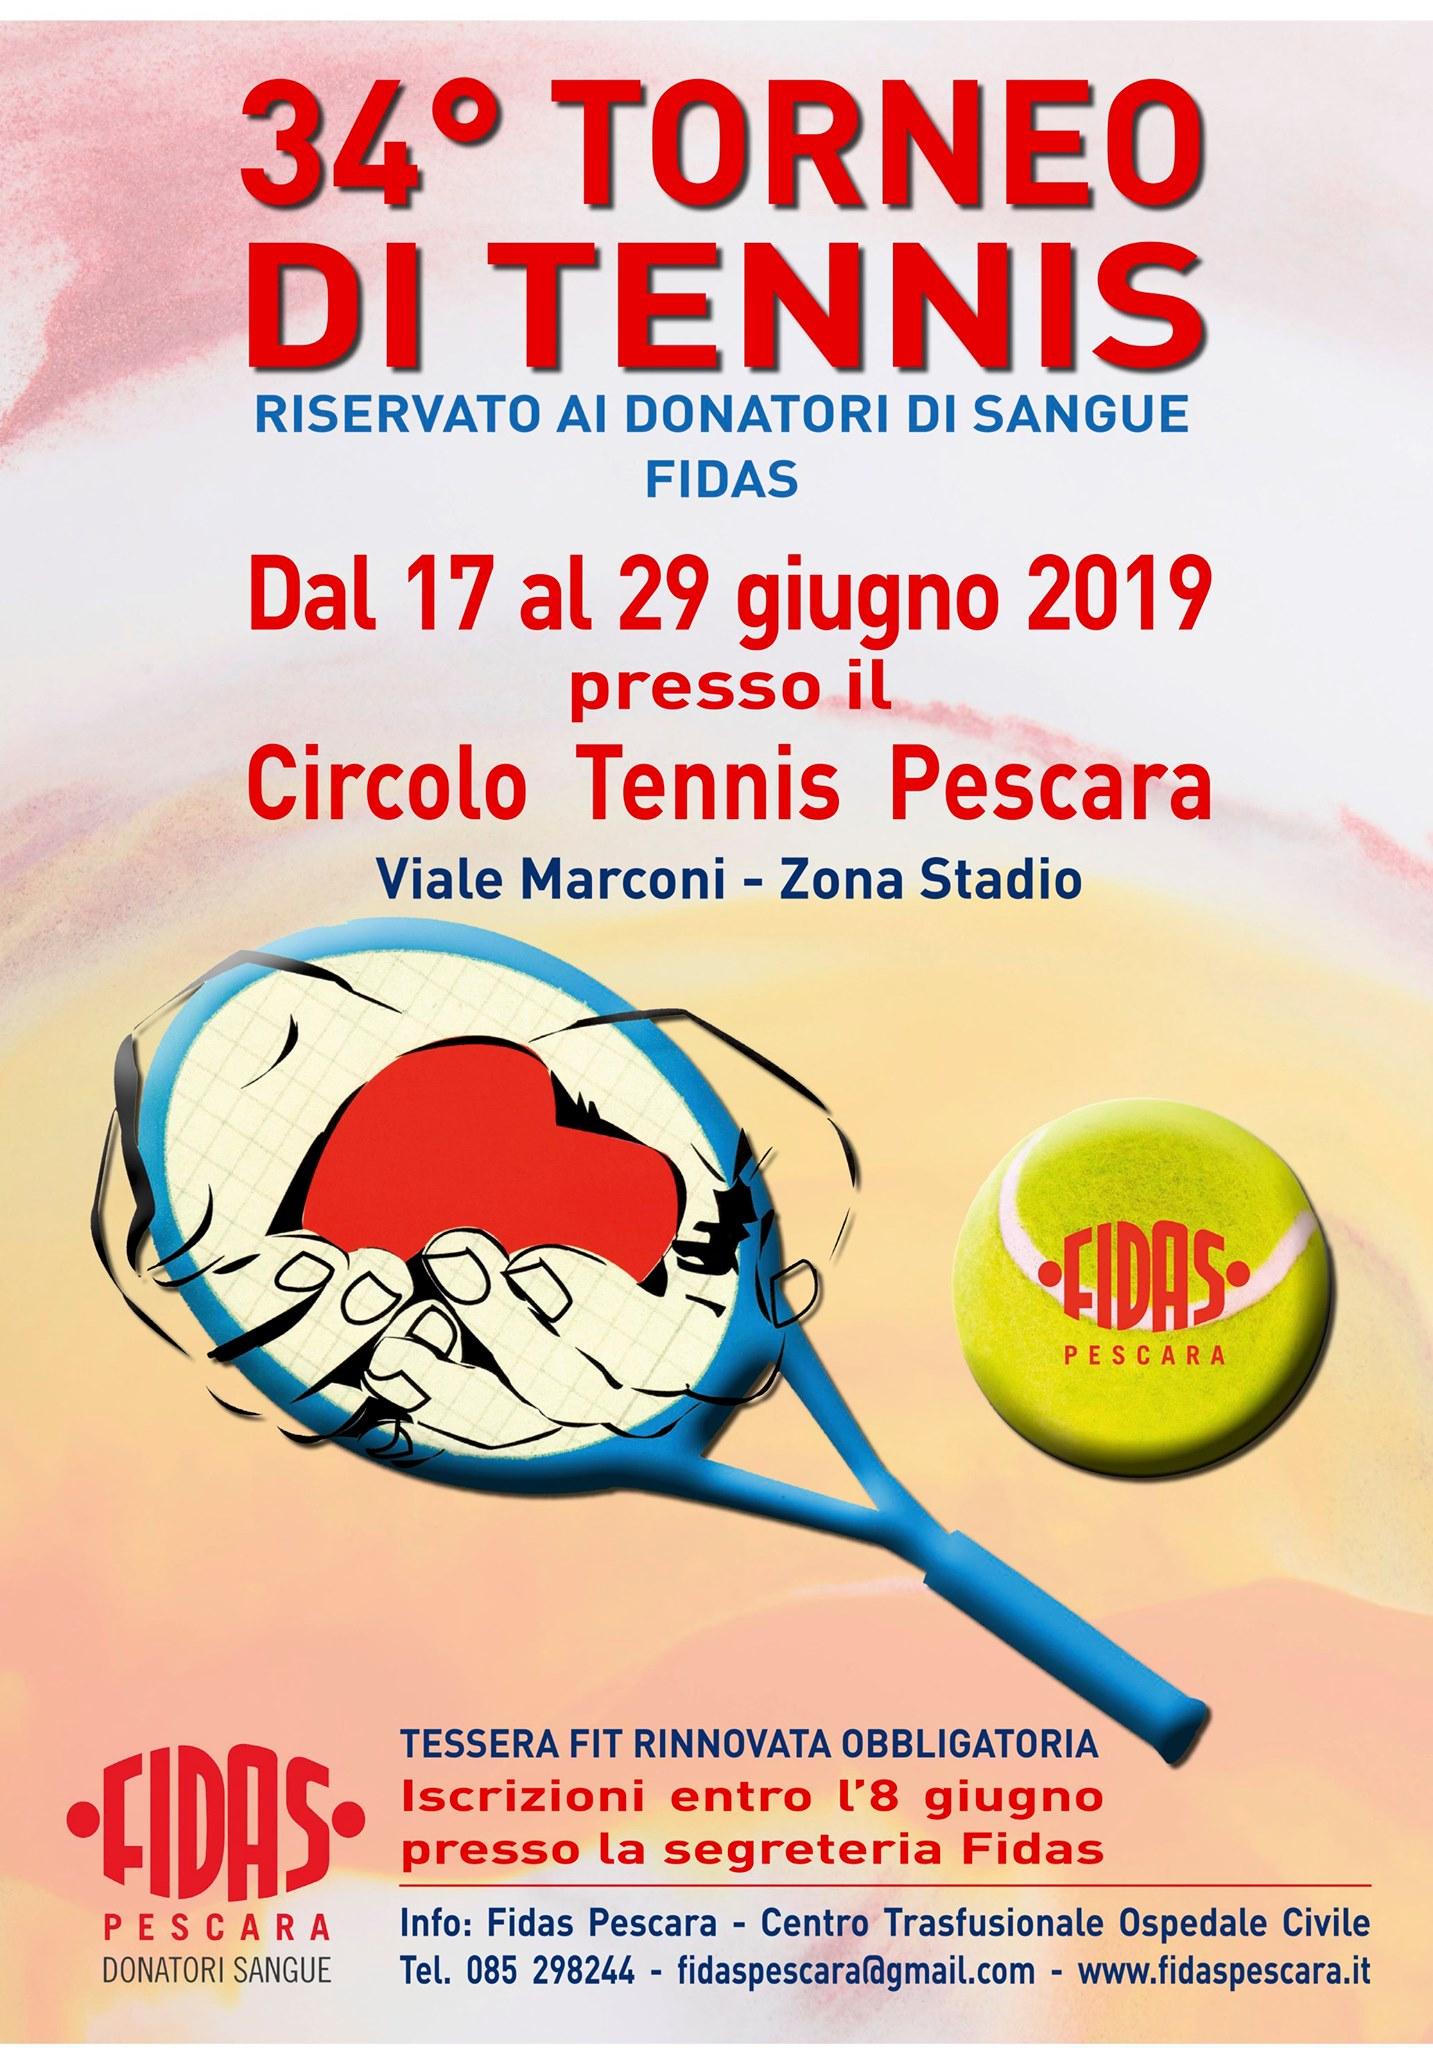 torneo tennis 2019.jpg